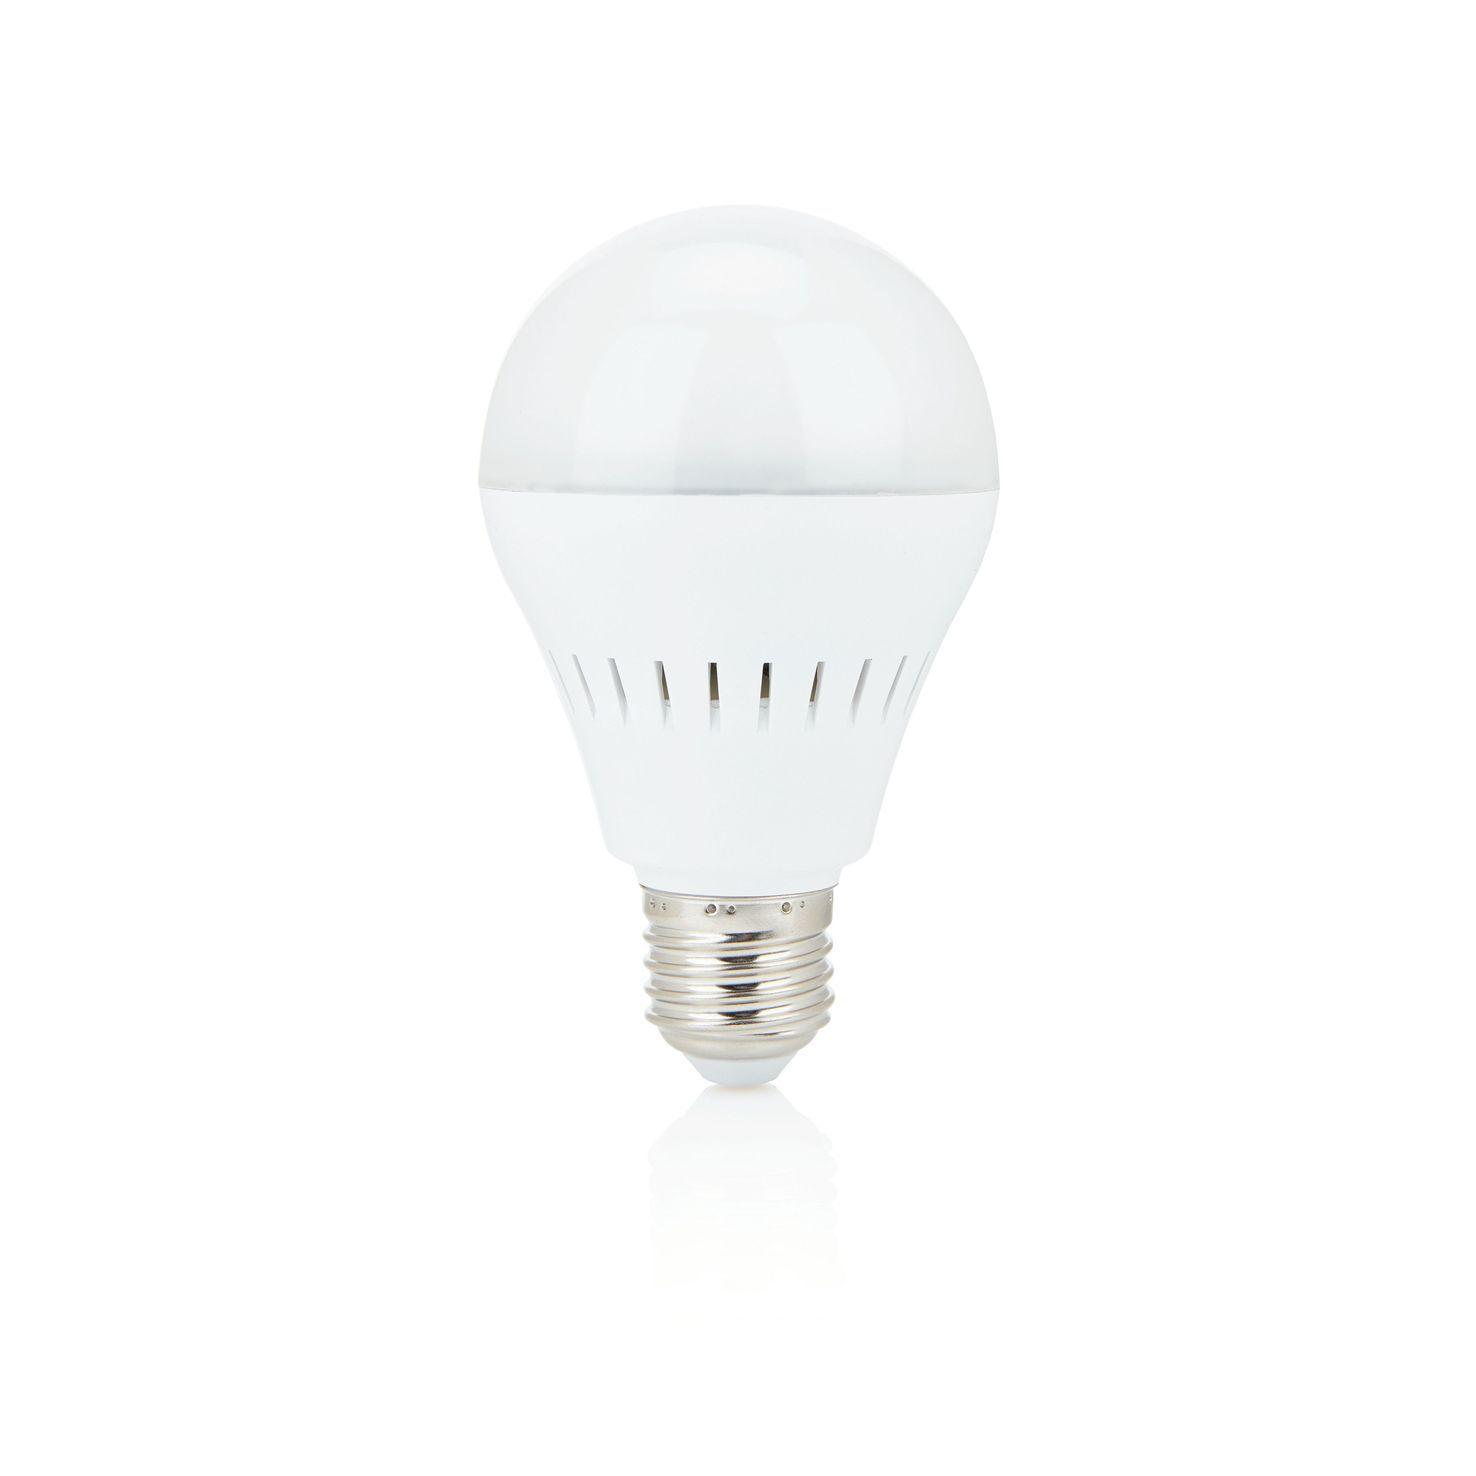 speaker 3 watt led lamp. Black Bedroom Furniture Sets. Home Design Ideas